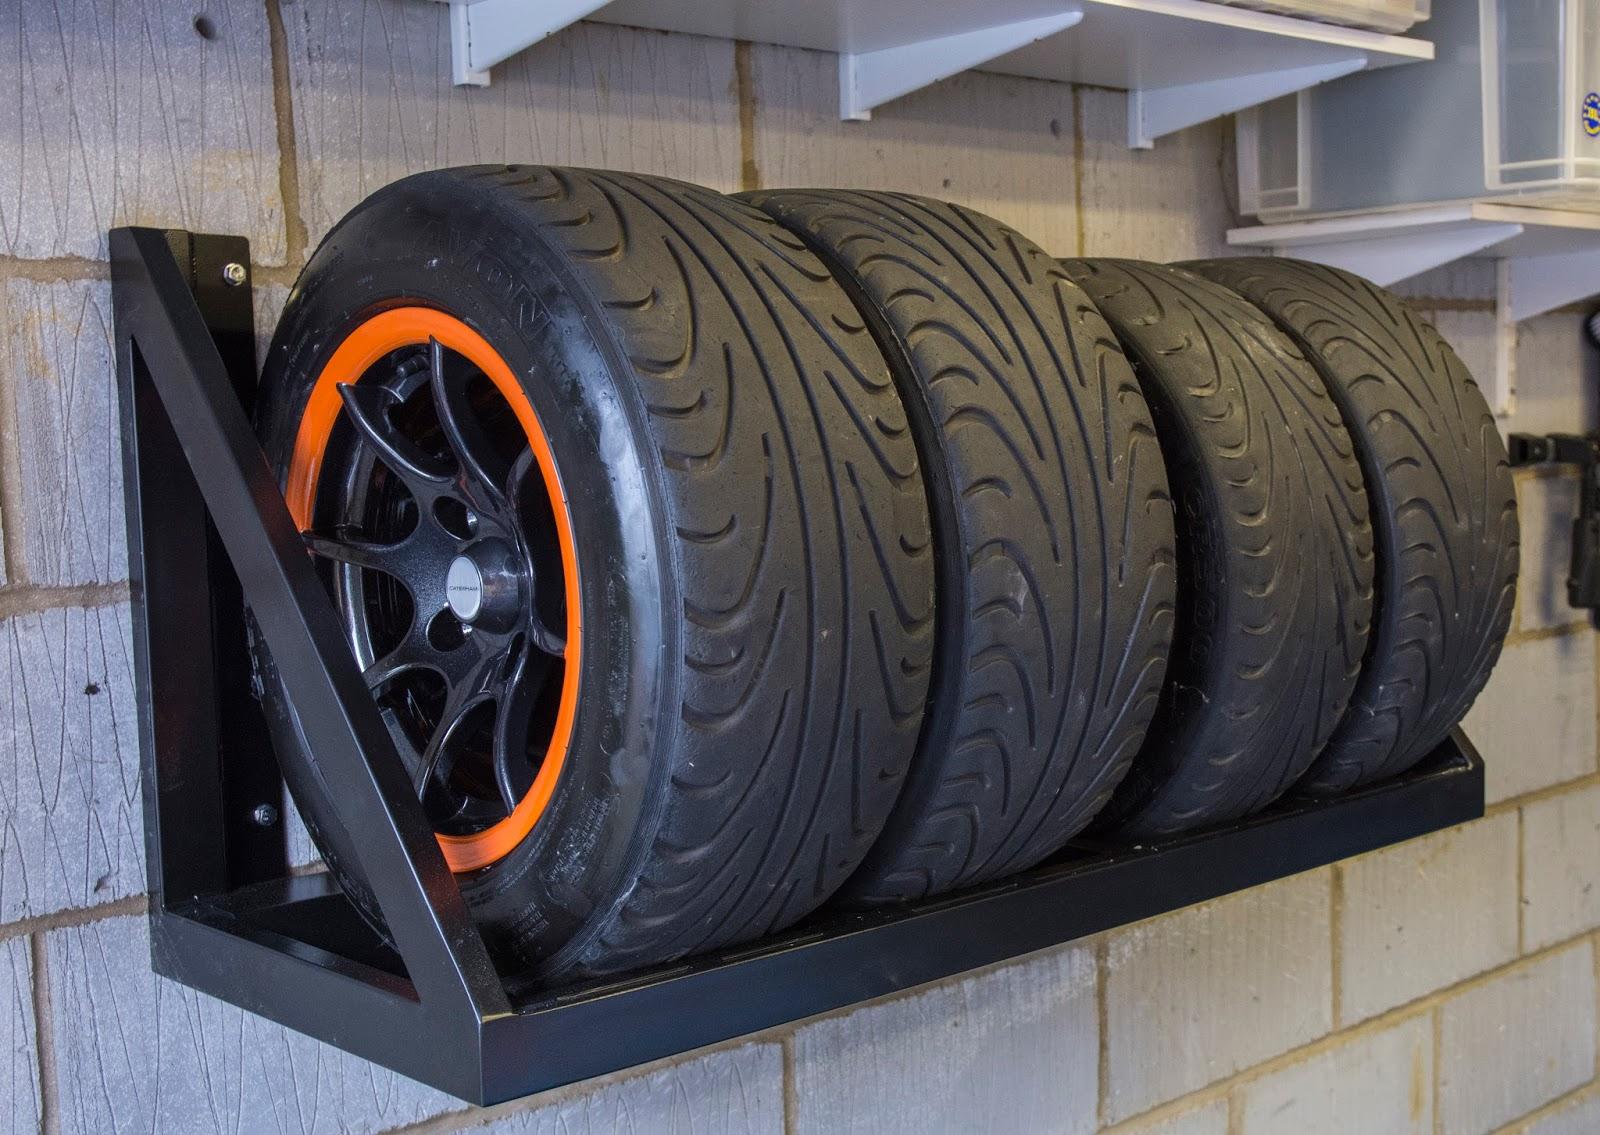 caterham r500 and academy racing wall mounted wheel rack